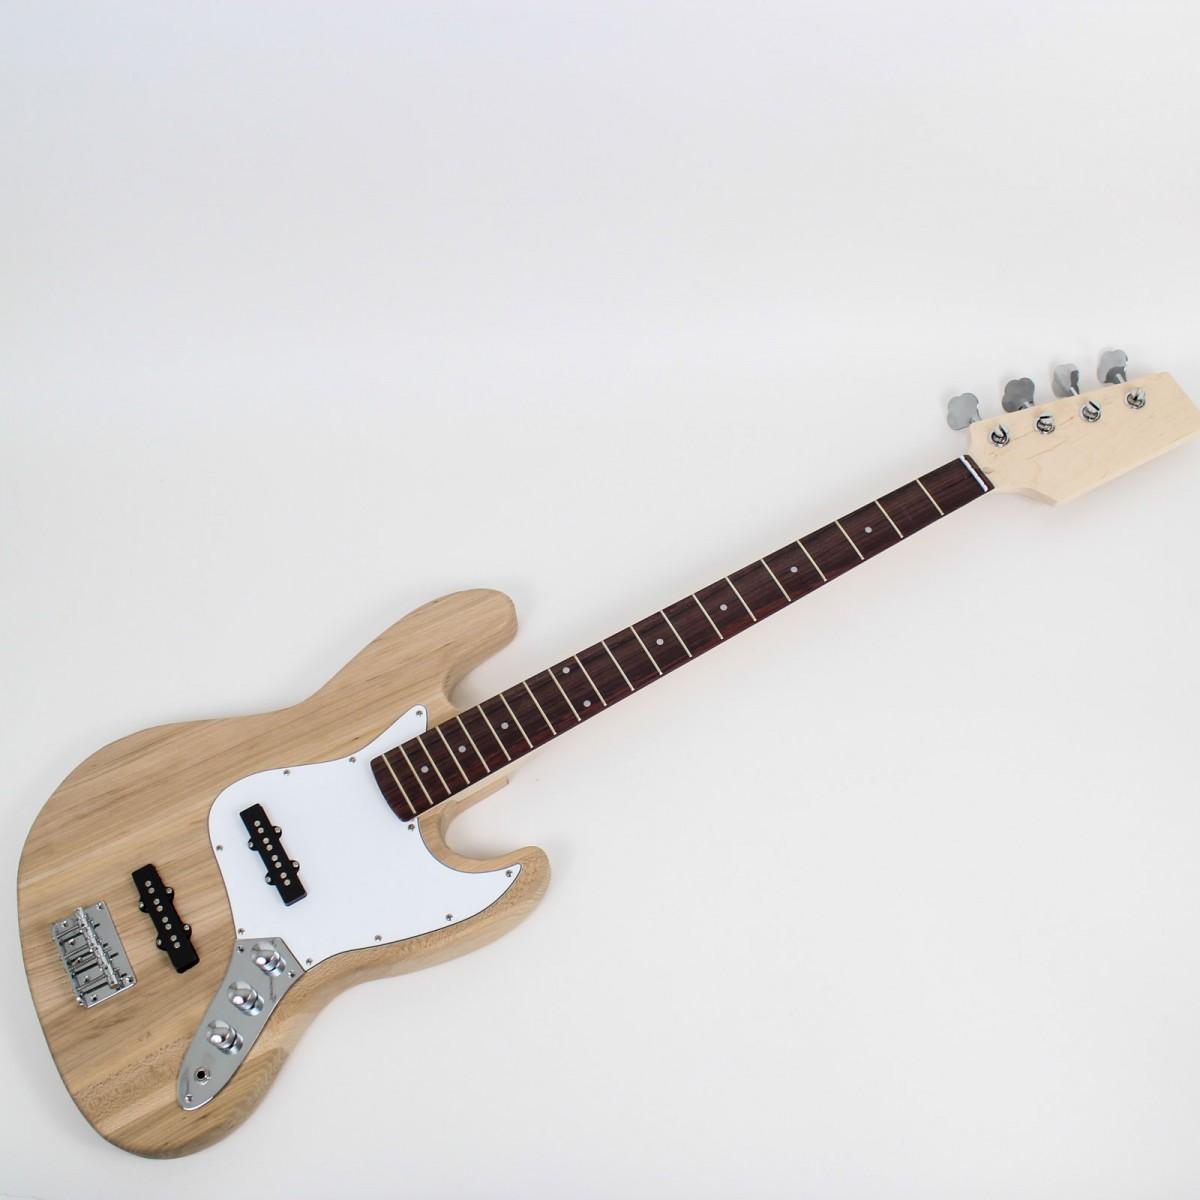 jazz bass style guitar kit ash body diy guitars. Black Bedroom Furniture Sets. Home Design Ideas